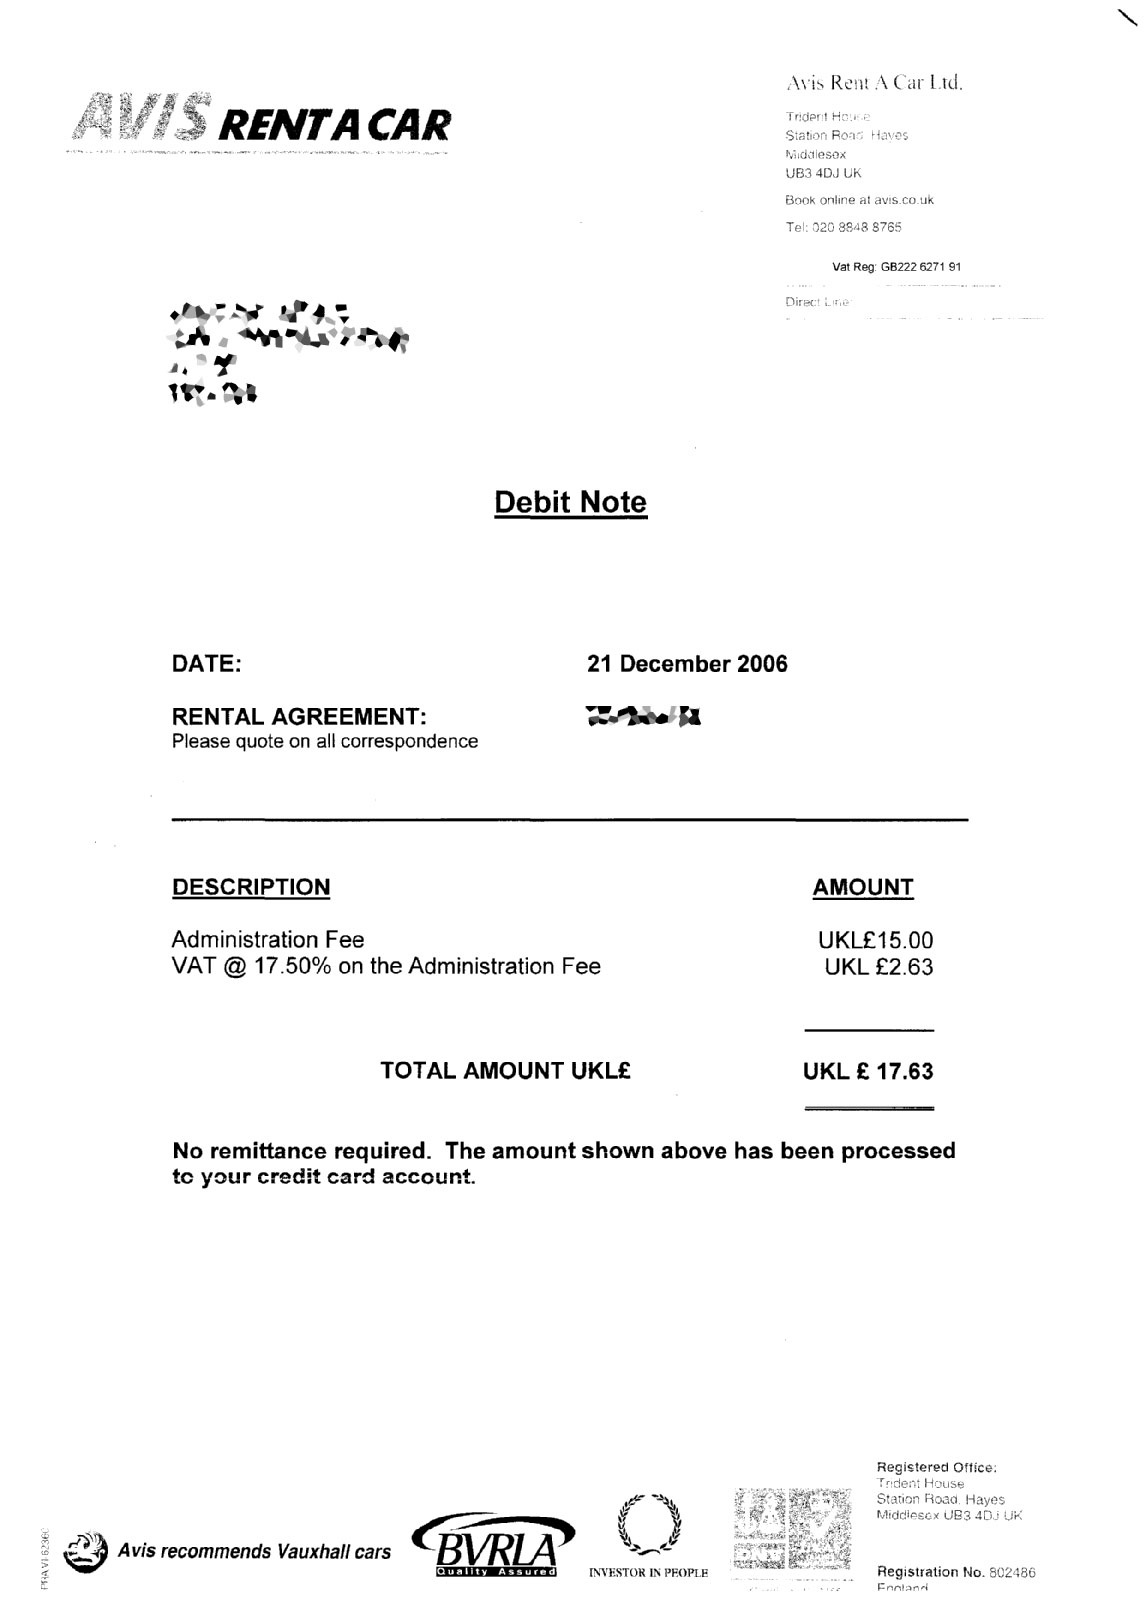 debit note sample – Debit Memo Sample